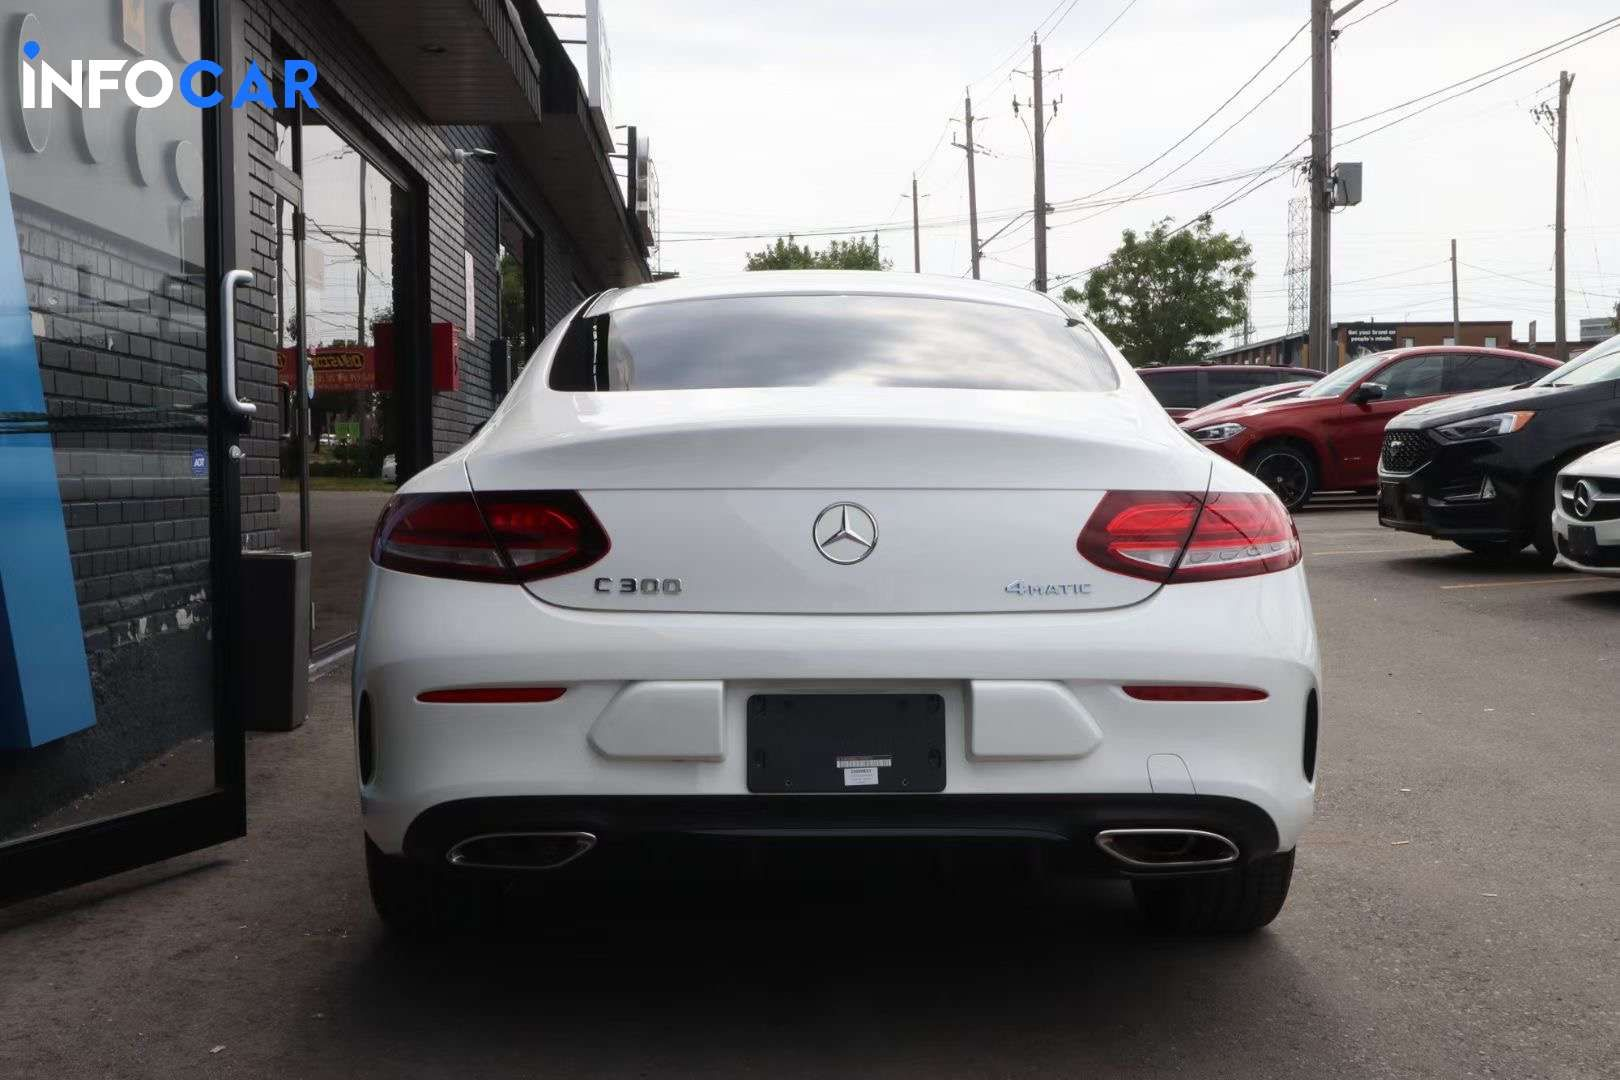 2020 Mercedes-Benz C-Class C300 - INFOCAR - Toronto's Most Comprehensive New and Used Auto Trading Platform